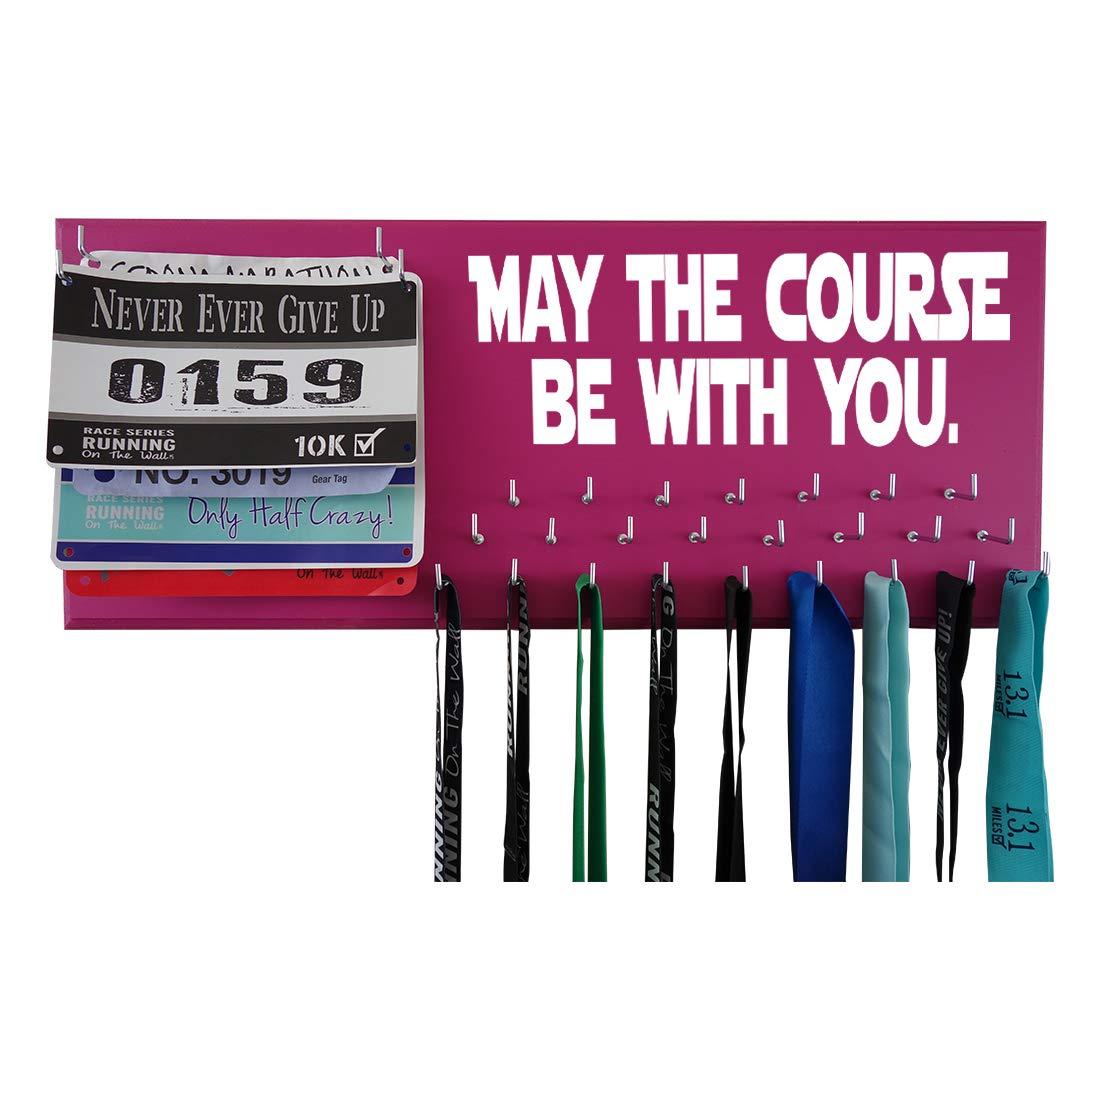 Running on the Wall – Race Bib and Medal表示rack-壁マウントスポーツメダルホルダーとハンガー5、K 10 K、マラソンランナー – May The Course Be With You B01N3Q1C61 ホットピンク